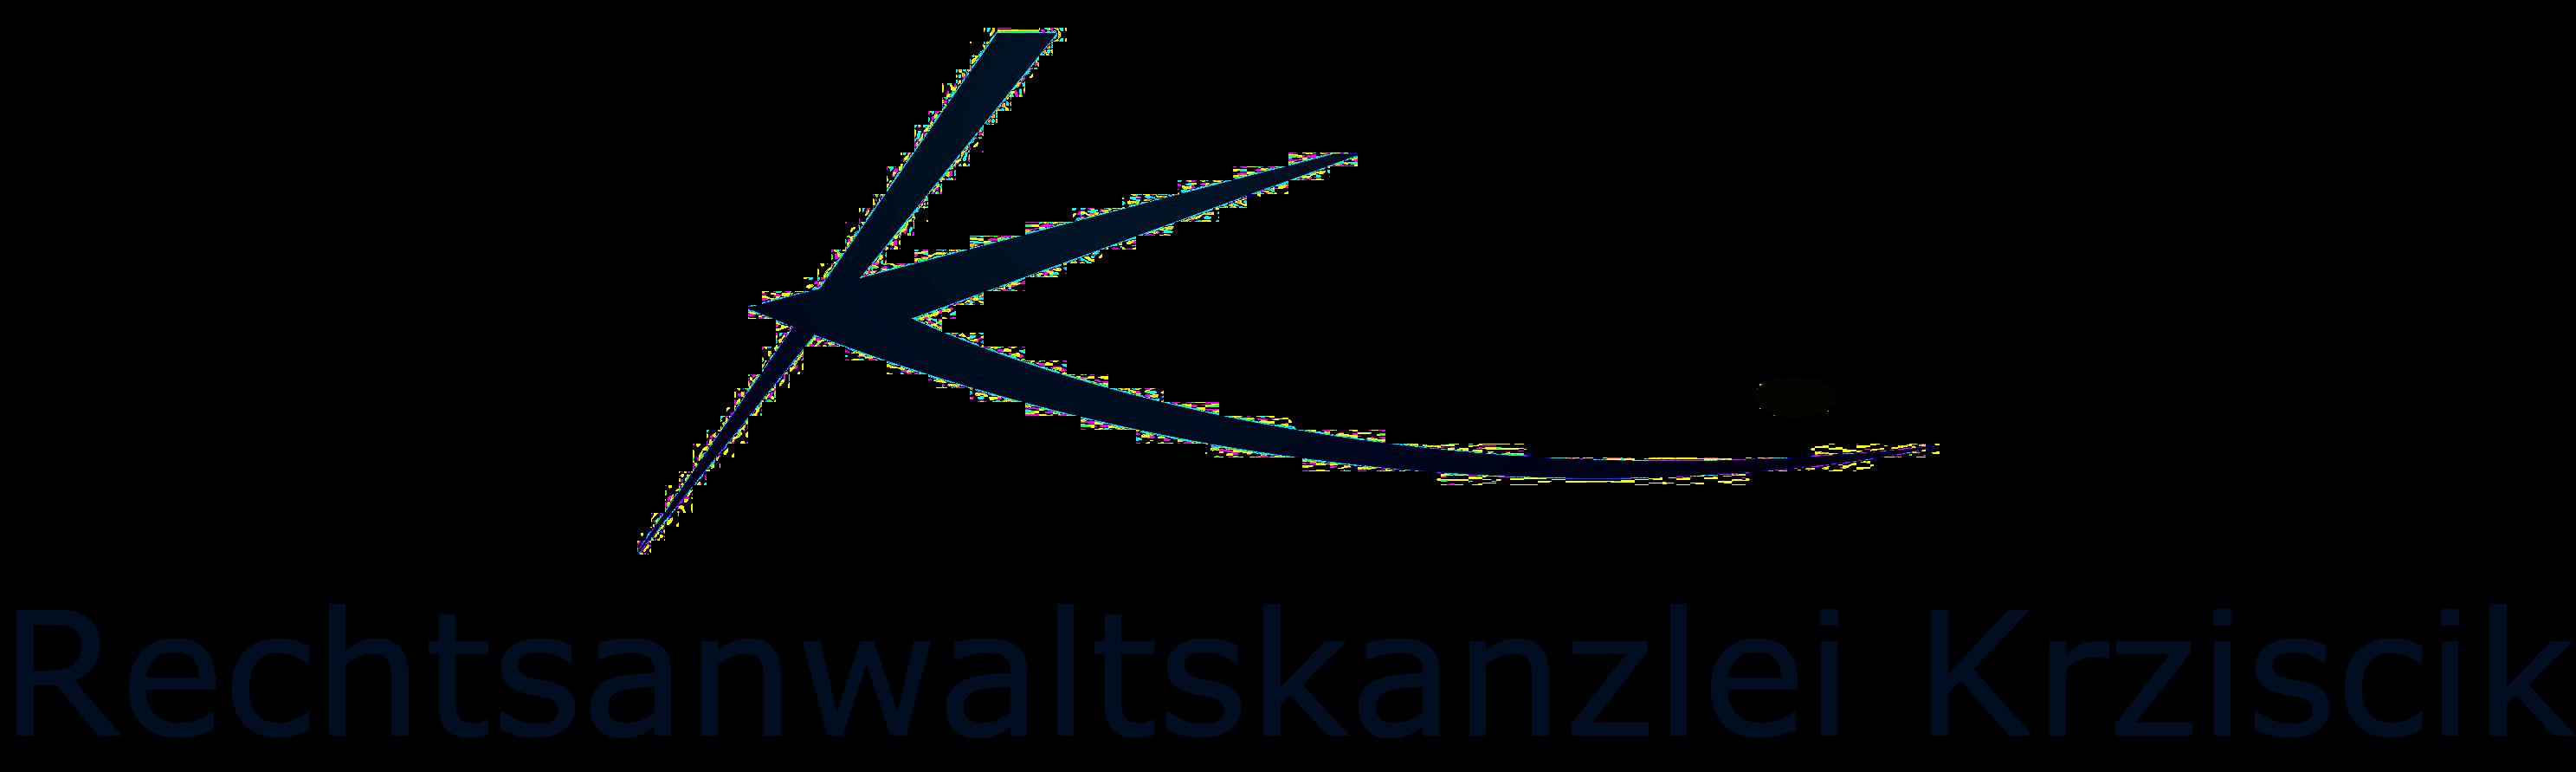 Rechtsanwaltskanzlei Krziscik